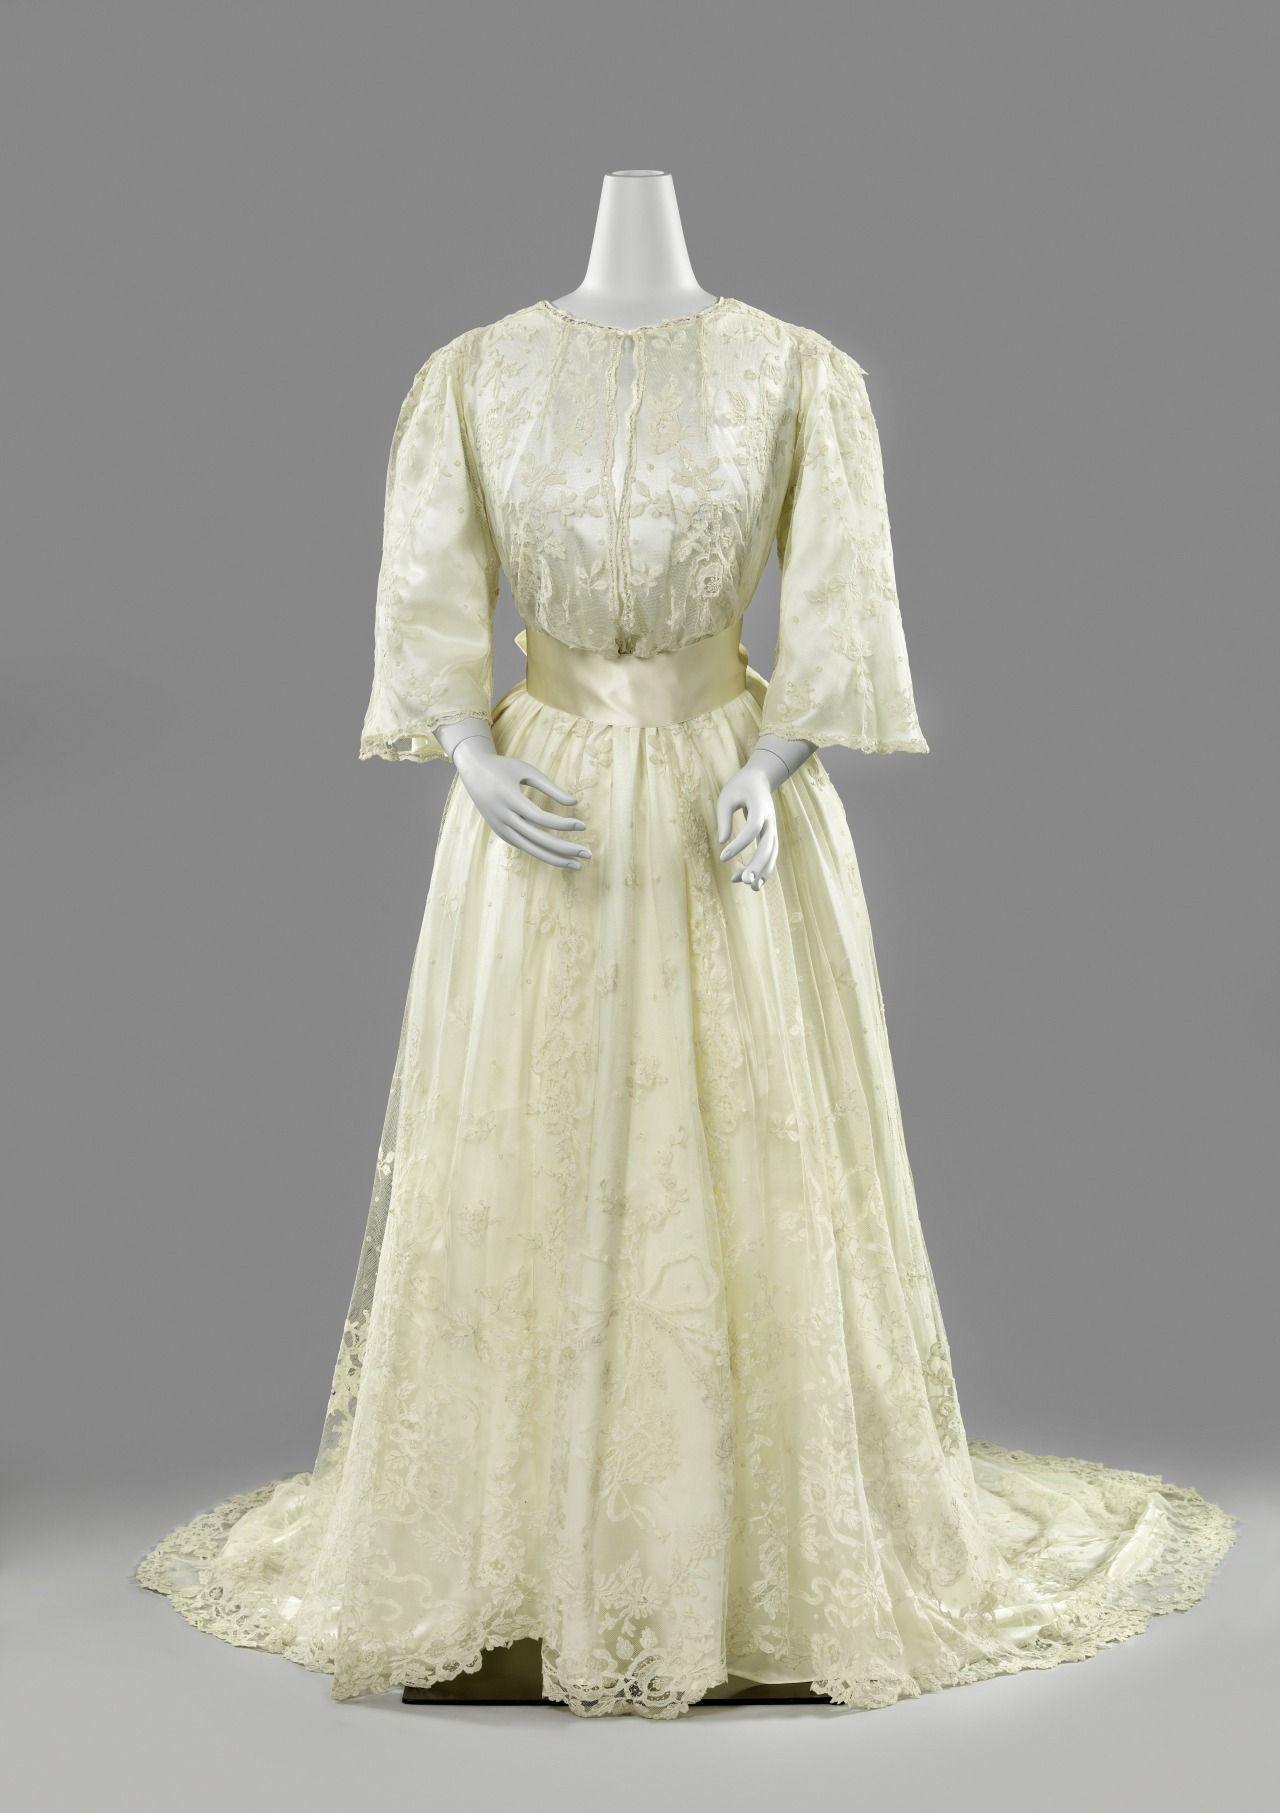 Fashions From History Wedding Dress c.1889-1892 This wedding dress ...